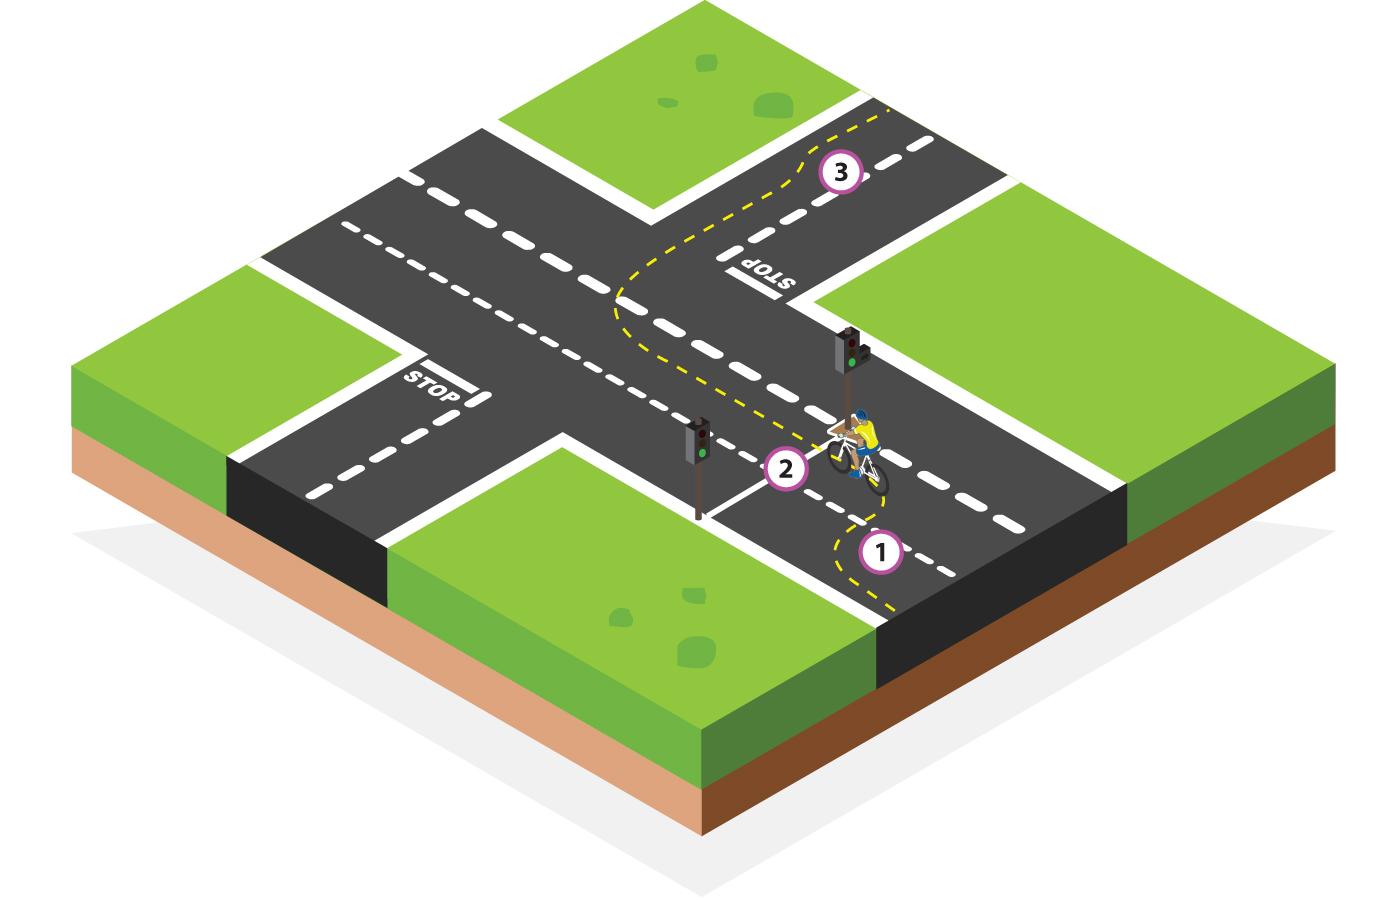 Traffic lights dual lane right arrow green